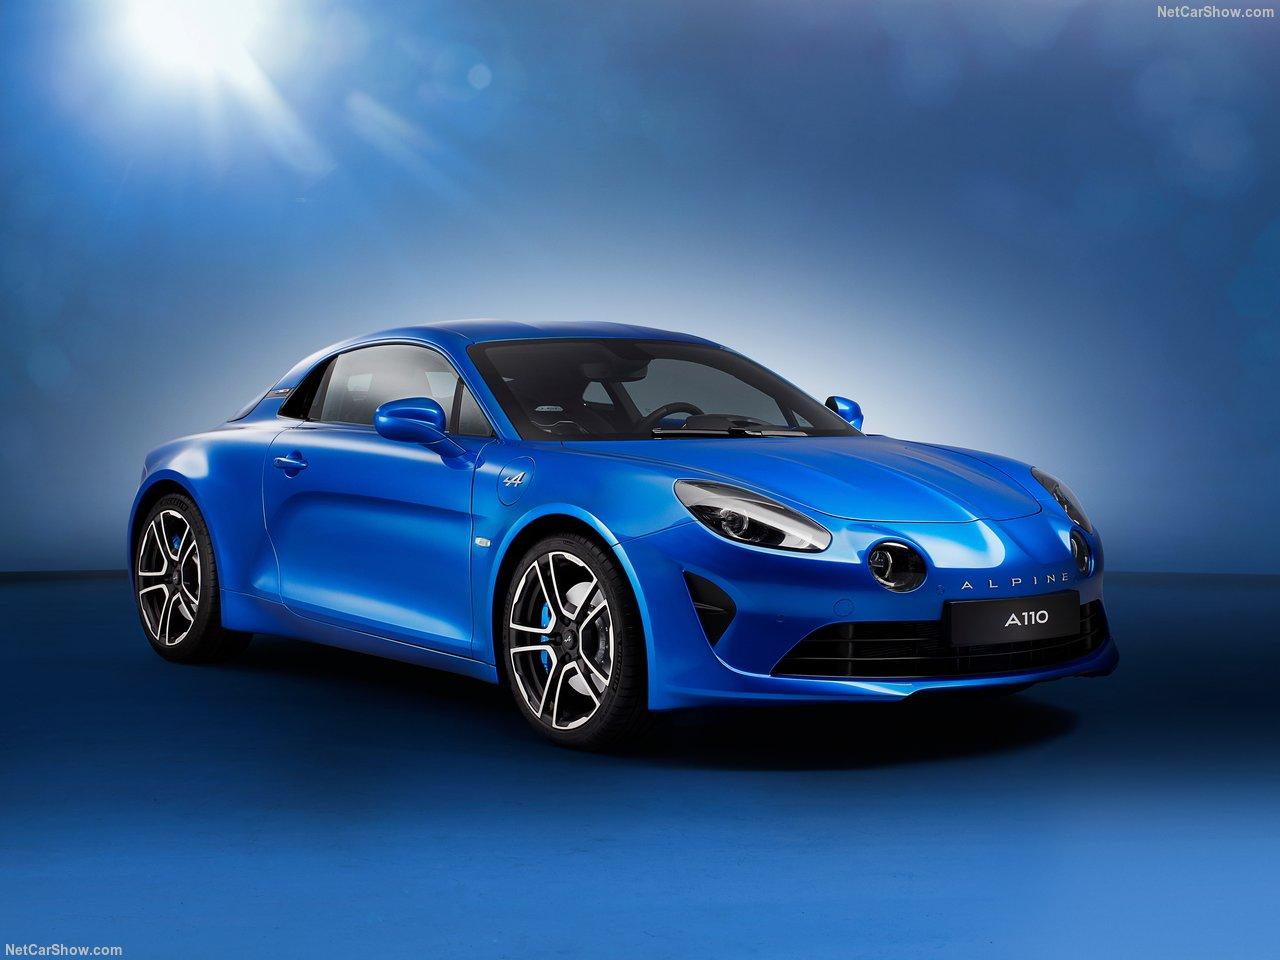 Car Wallpapers Netcarshow 2018 Alpine A110 Price Specs Design Interior Exterior